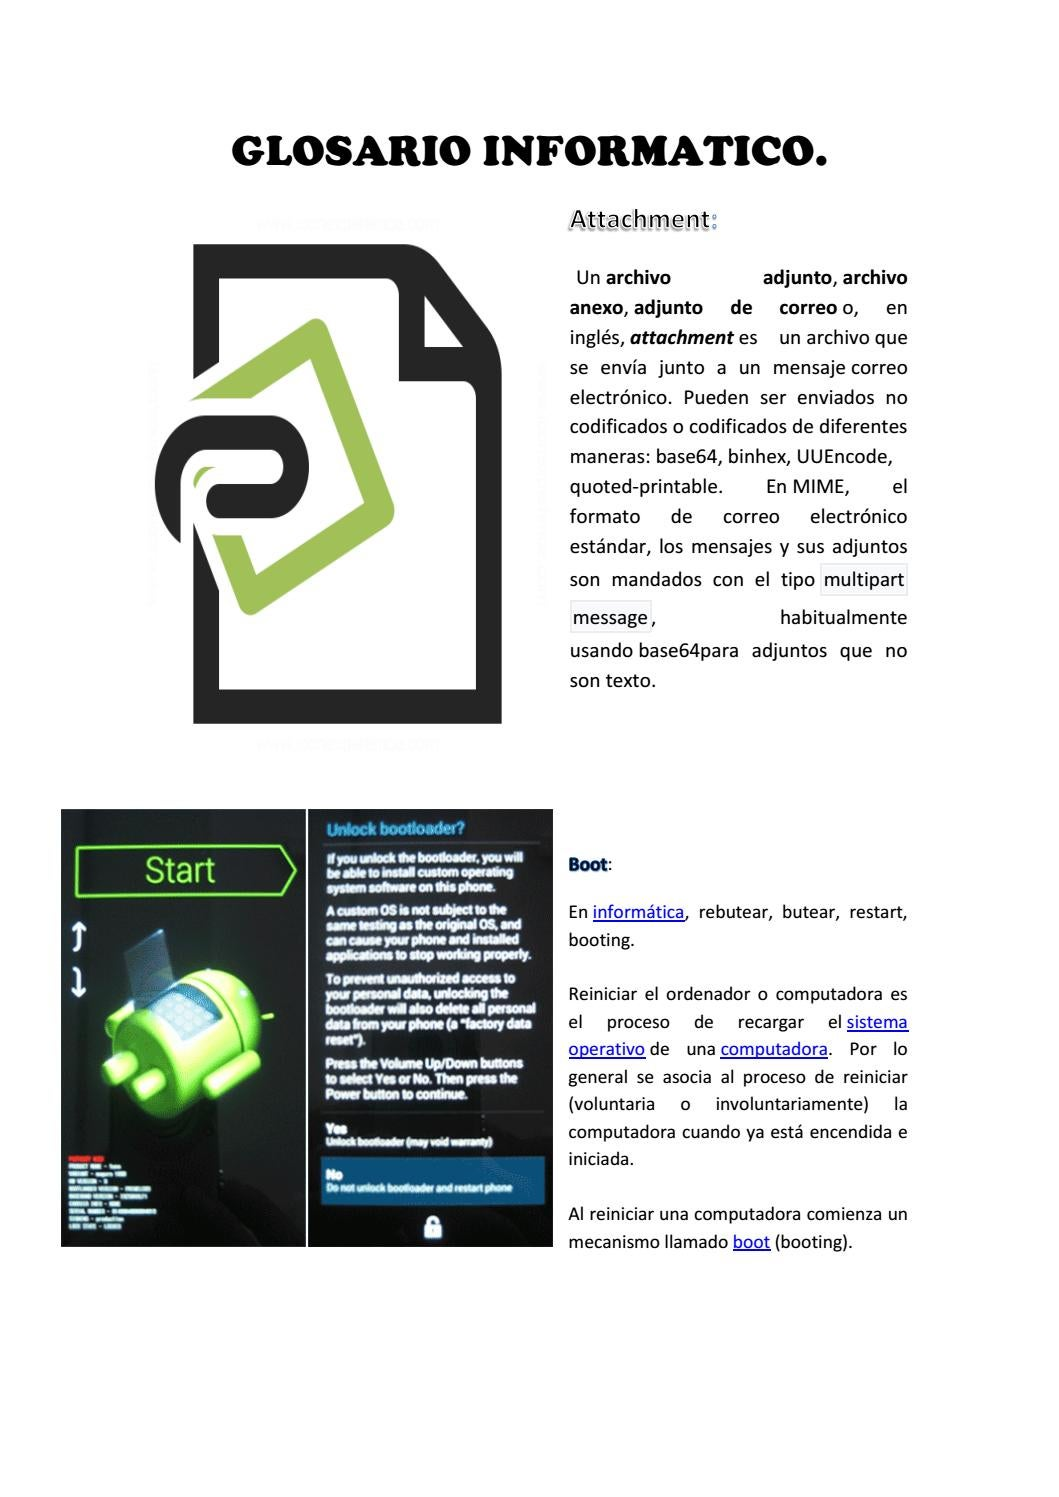 Glosario informatico by oscar rodriguez - issuu